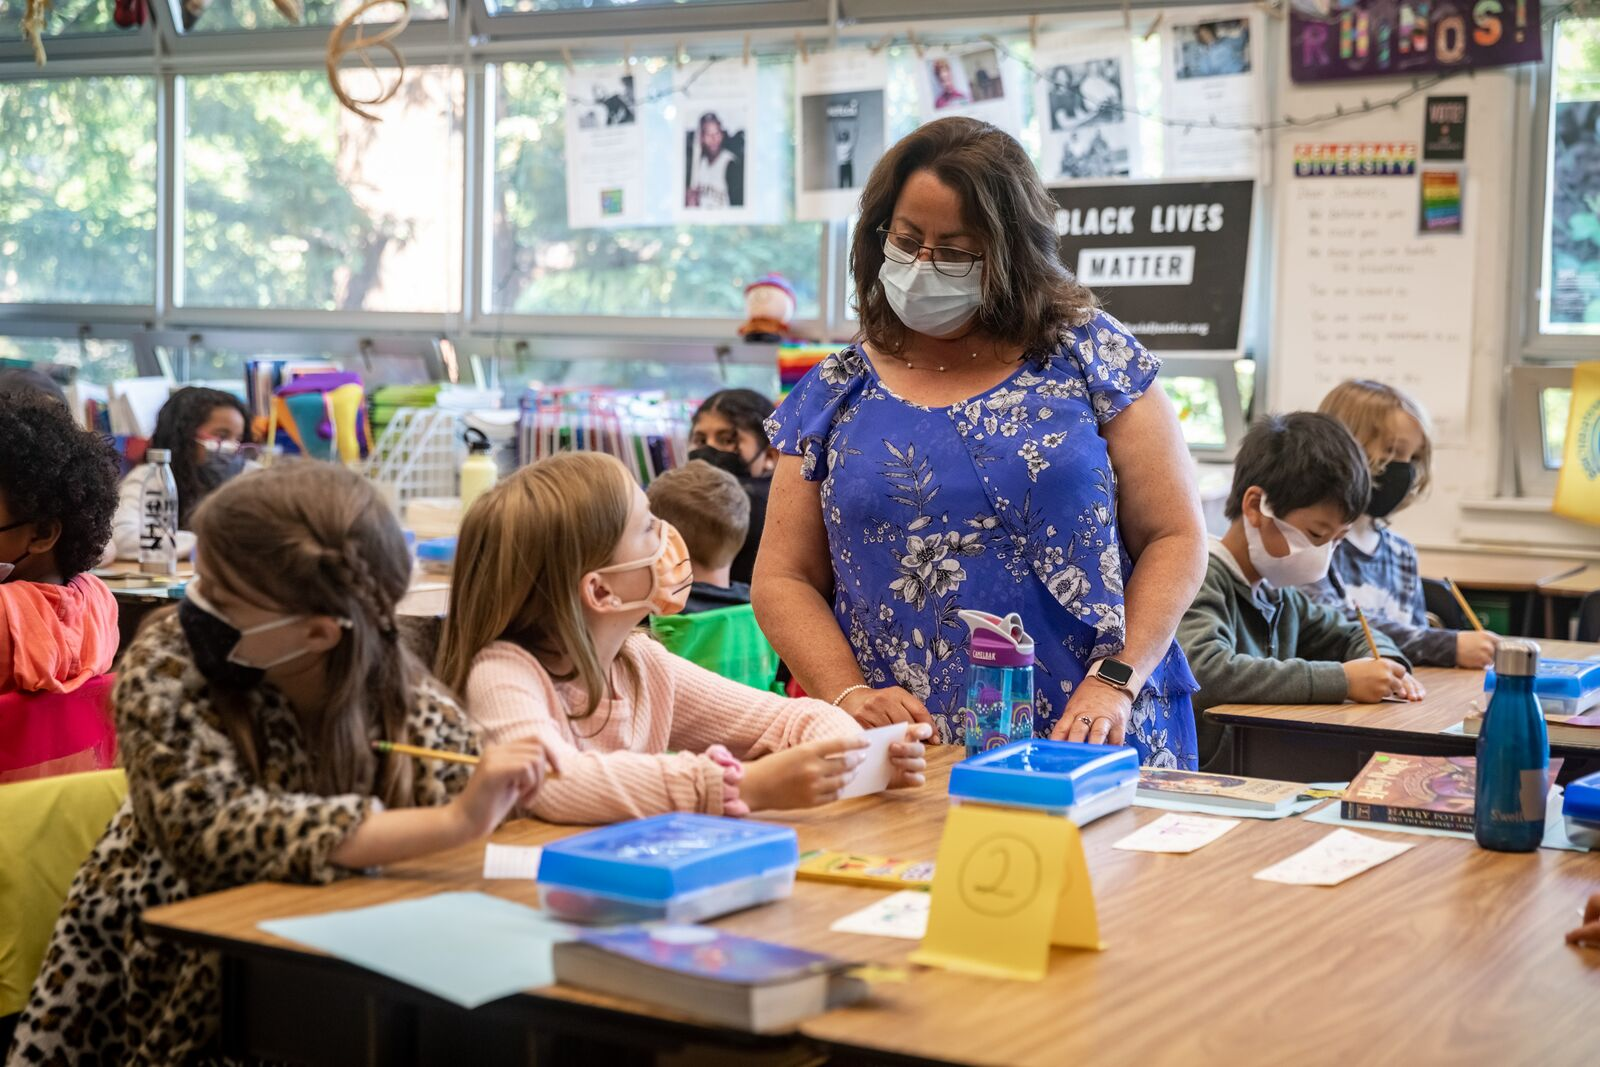 Washington Elementary School 5th grade teacher Mindy Geminder assists students with classwork on August 16, 2021. Credit: Kelly Sullivan